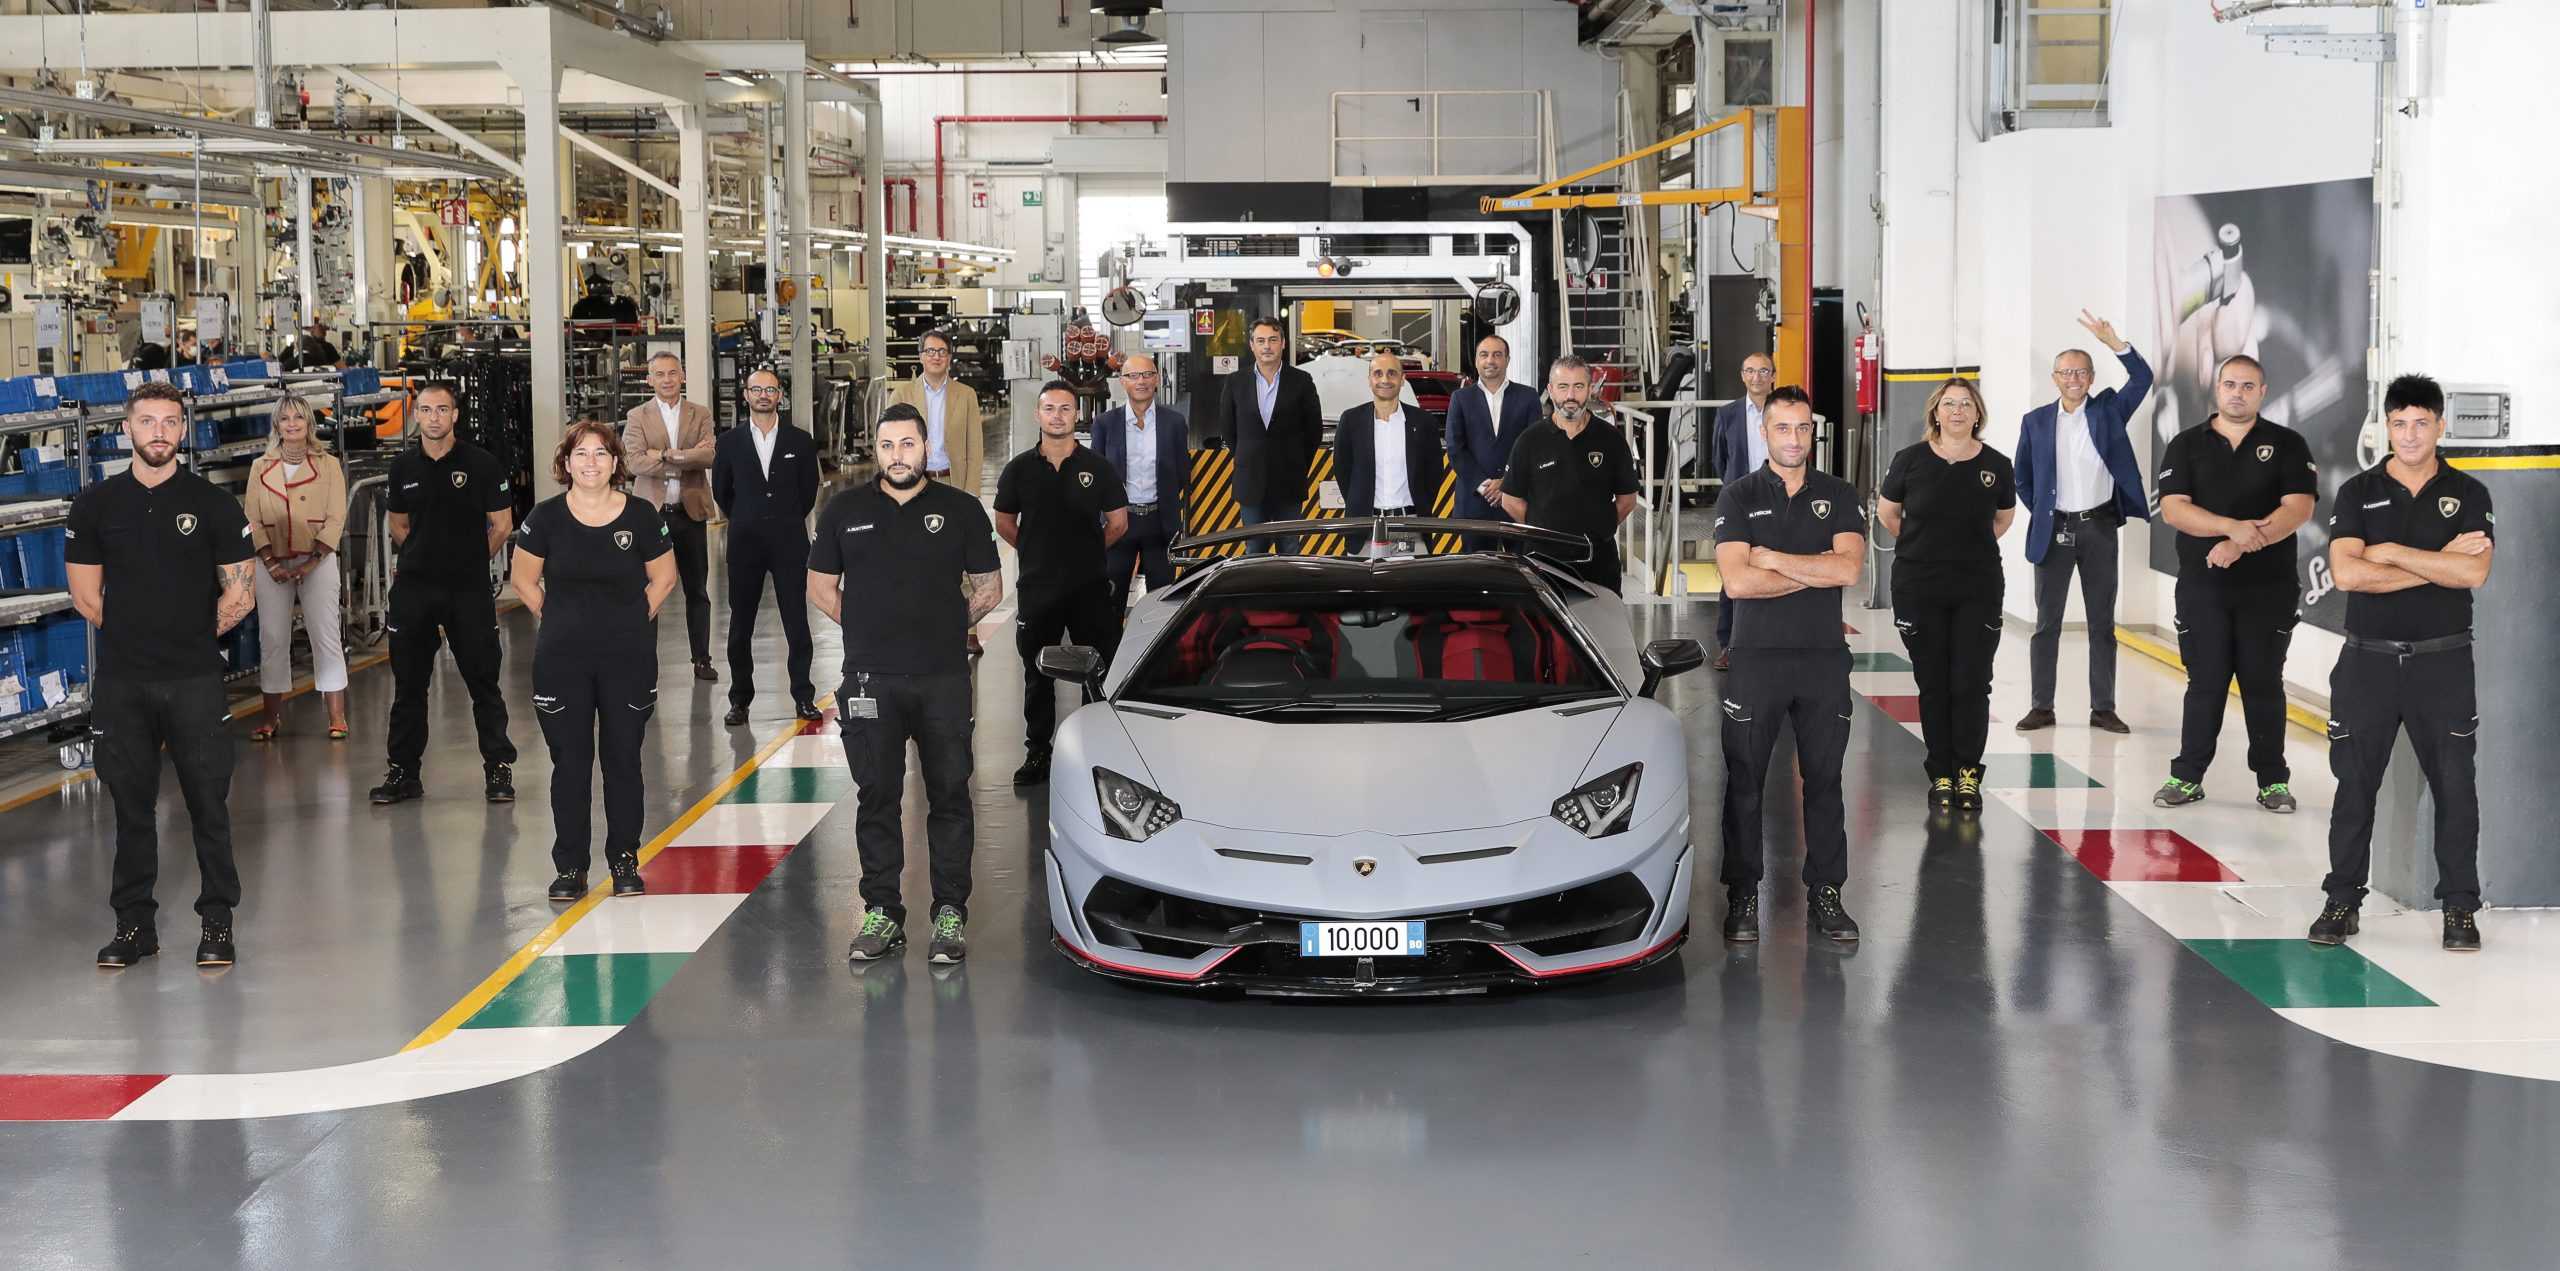 Lamborghini Aventador atinge marca de 10 mil unidades produzidas